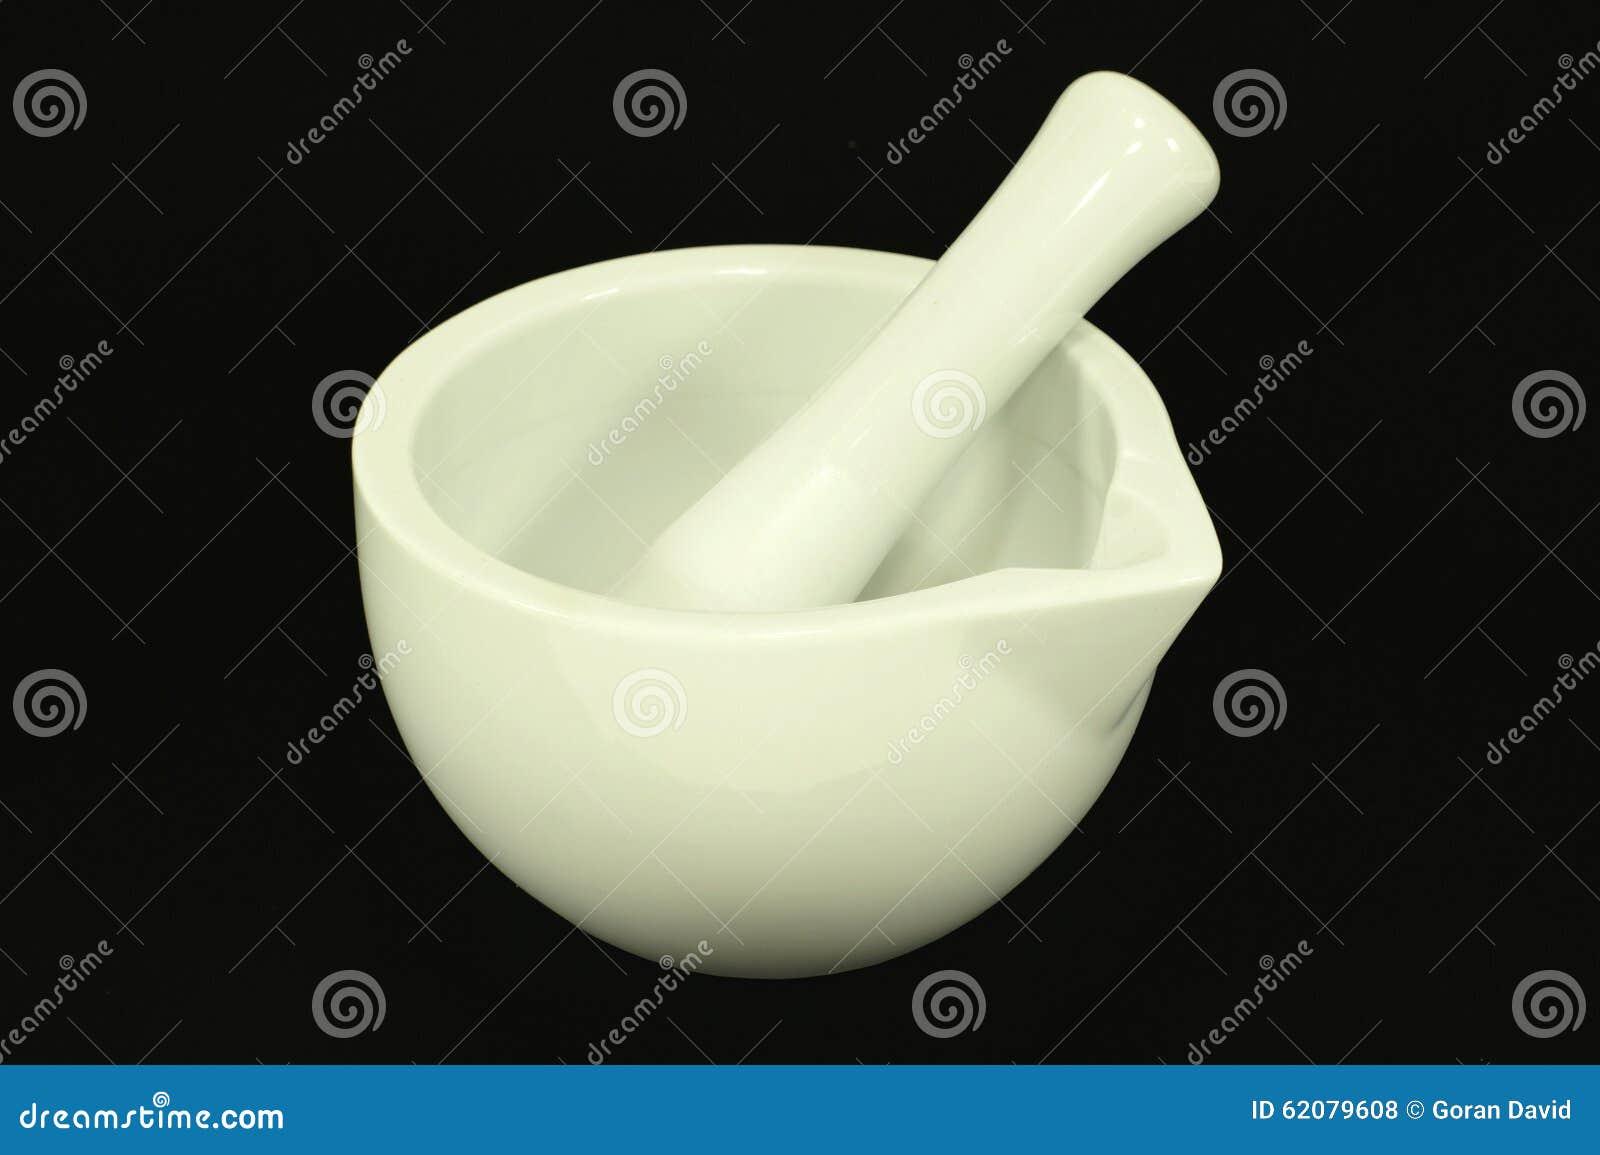 Porcelain Muddler Set With A Jar Stock Photo Image Of White